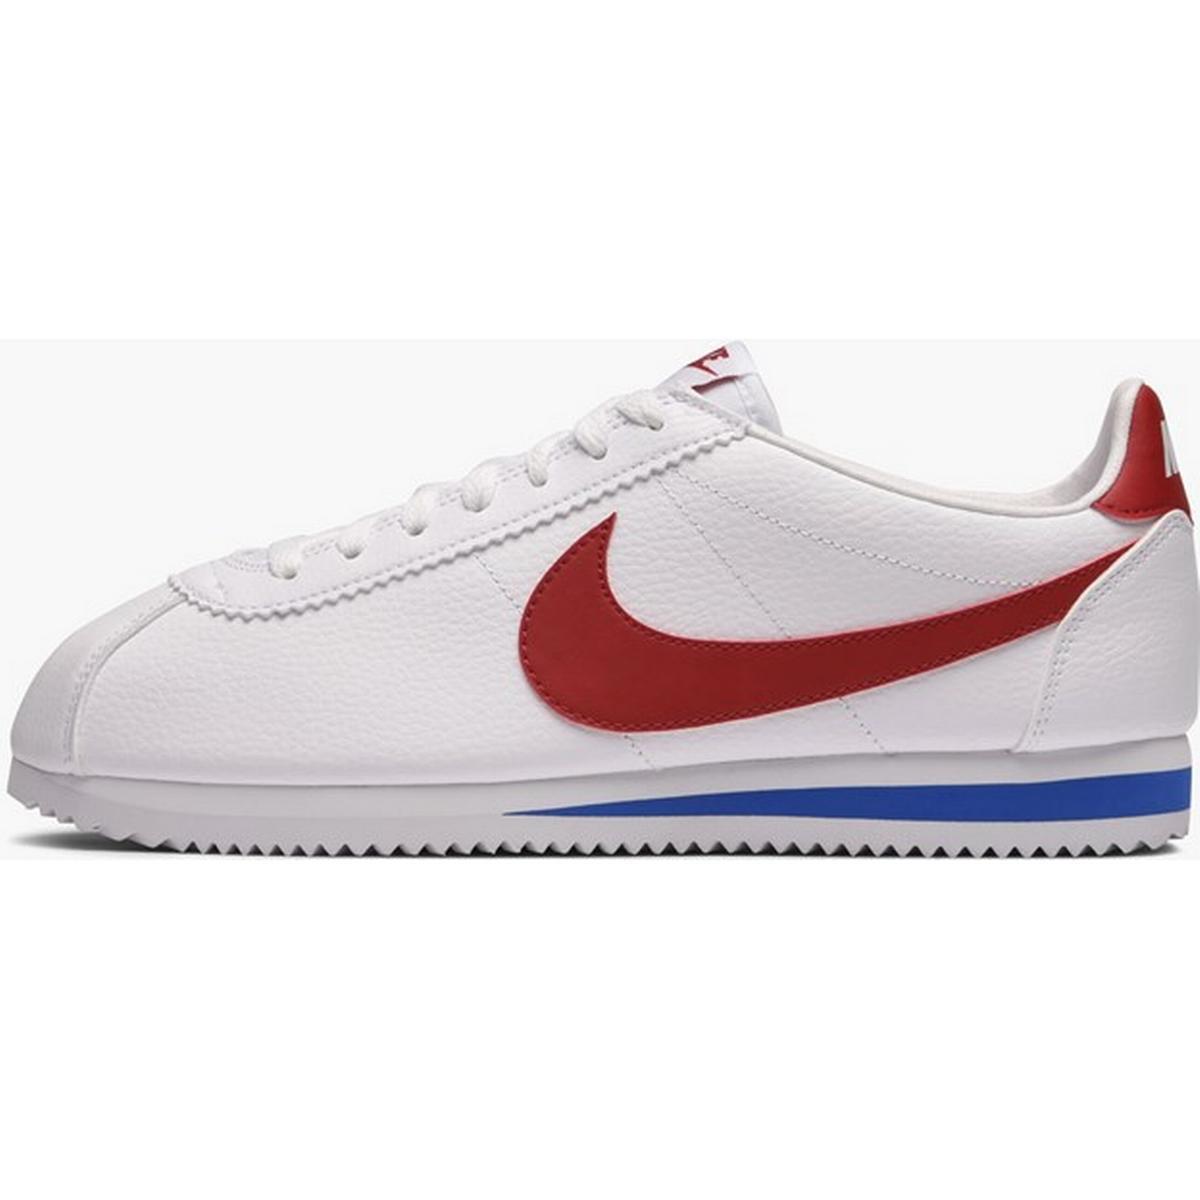 Nike Cortez Sko (300+ produkter) hos PriceRunner • Se priser